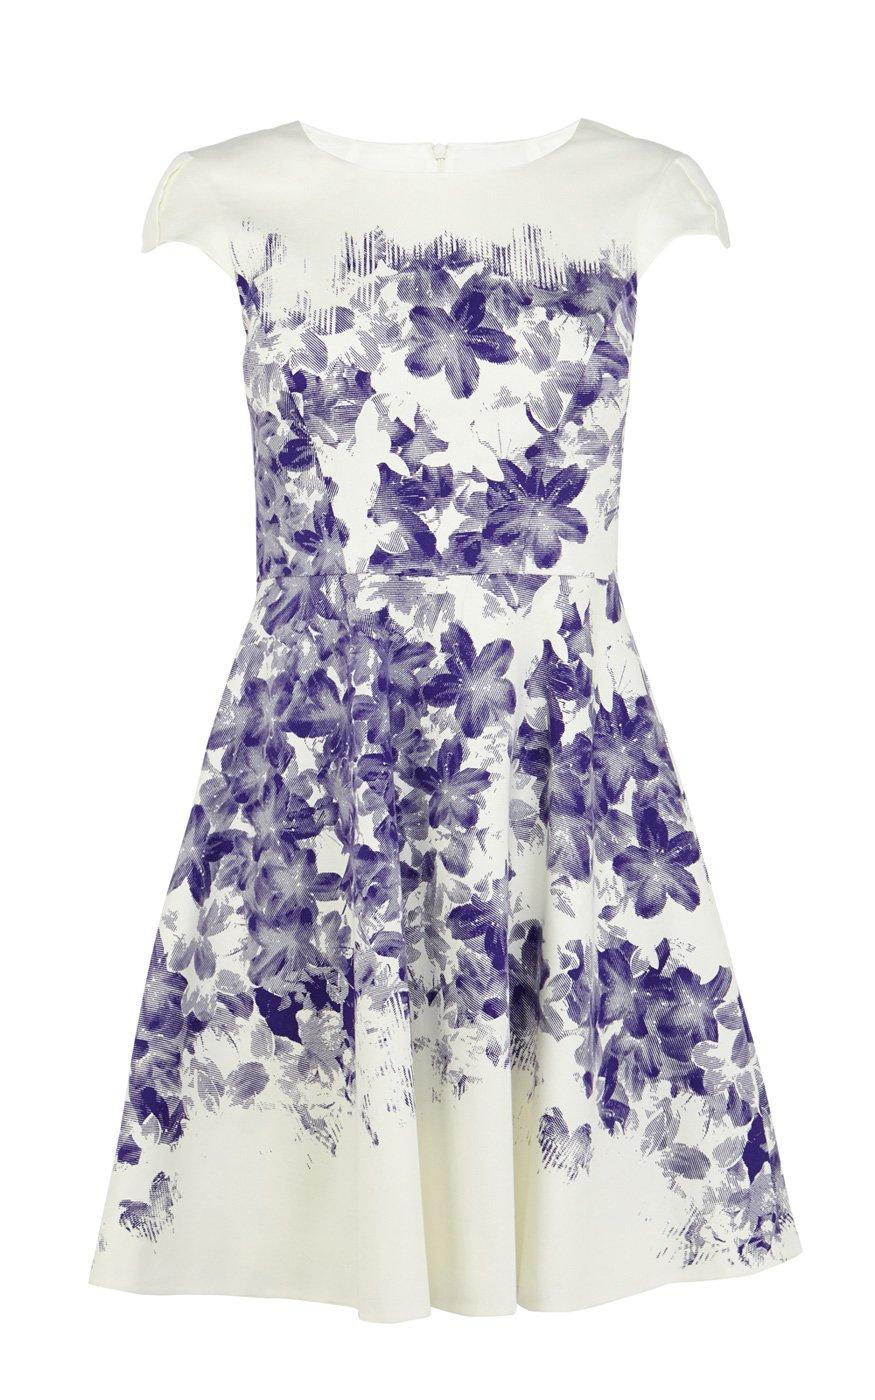 Lyst Karen Millen Floral Cotton Blend Dress In Blue